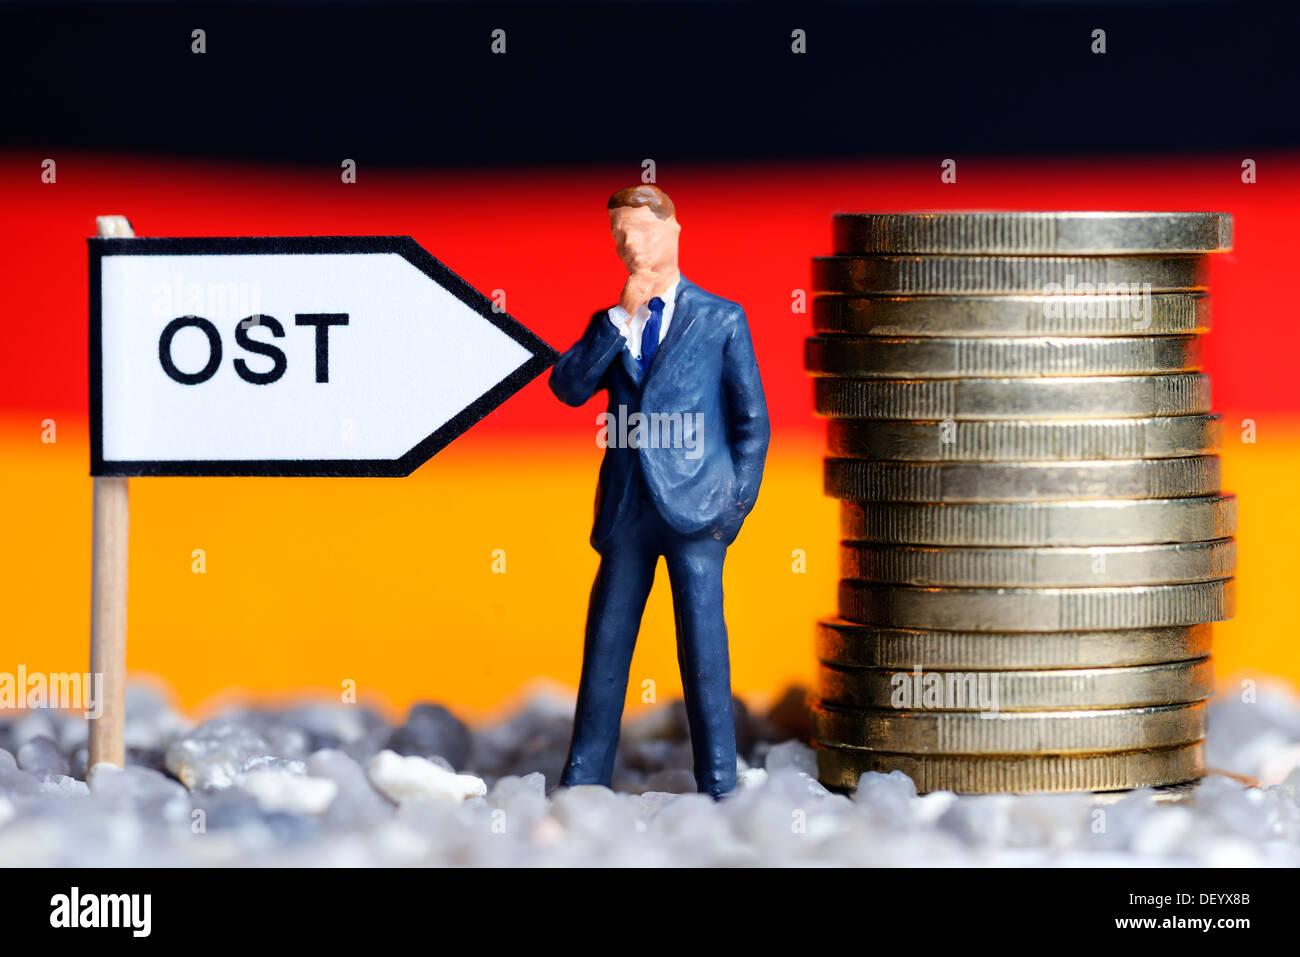 Signpost the east, retention solidarity tax, Wegweiser Ost, Beibehaltung Solidaritätszuschlag - Stock Image